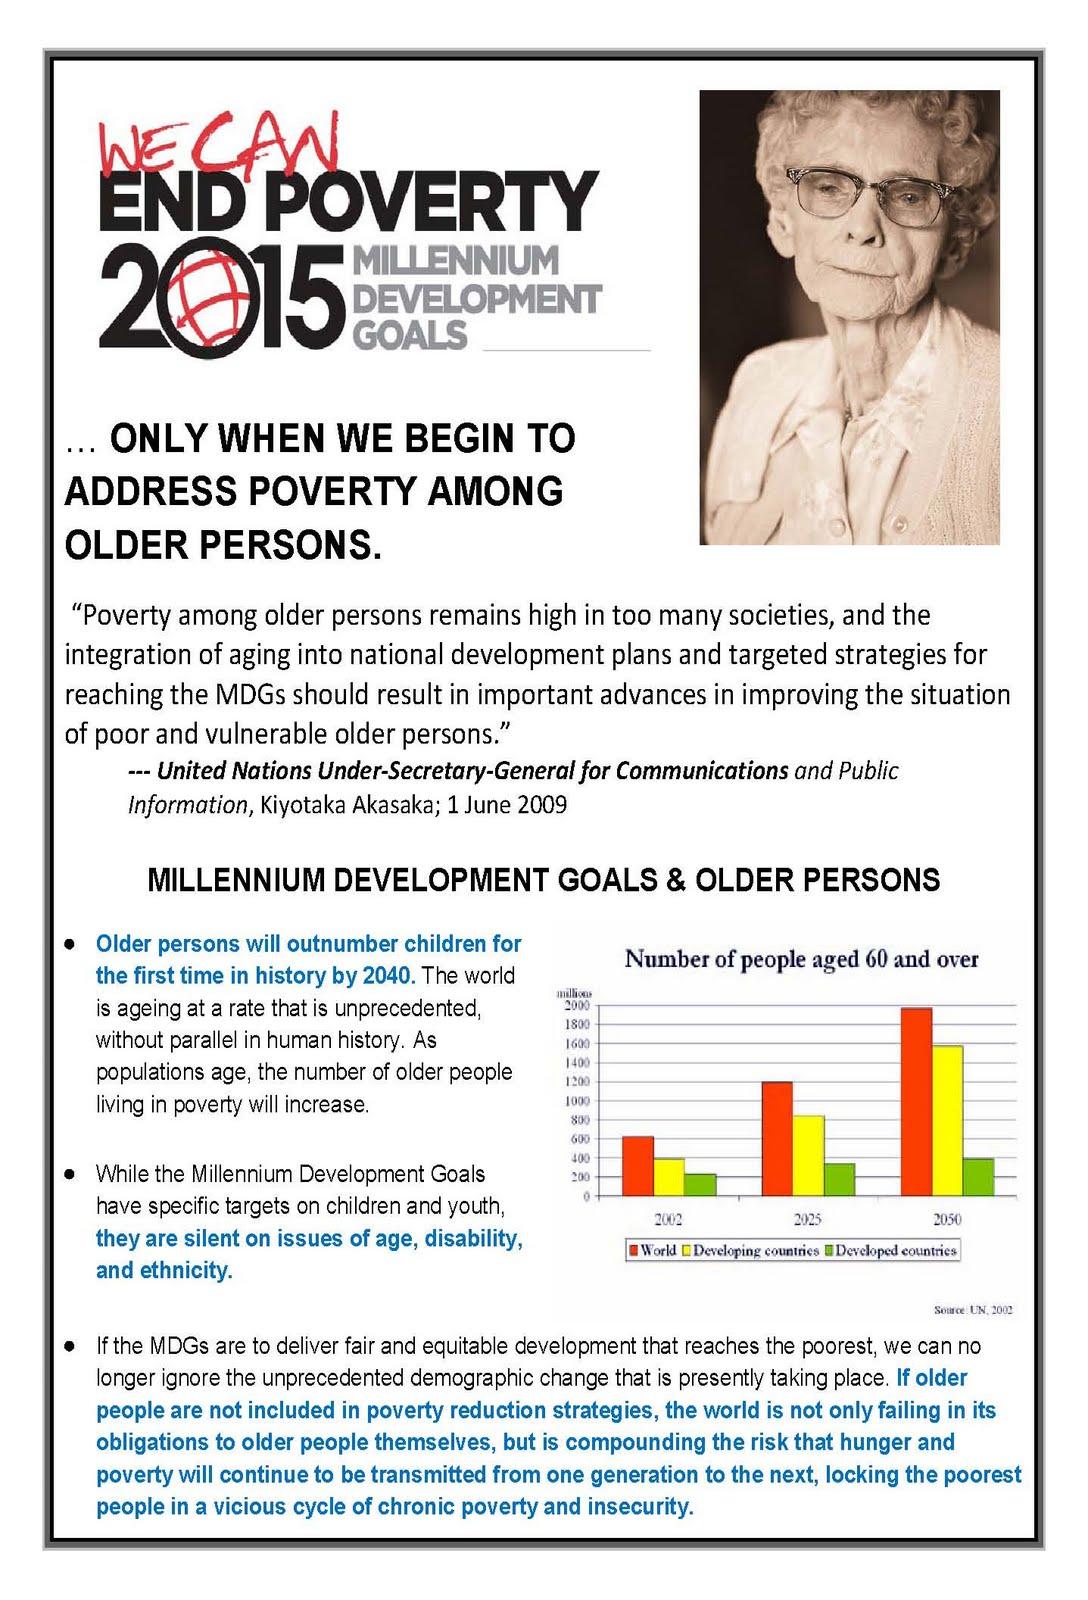 8 millennium development goals and their targets pdf